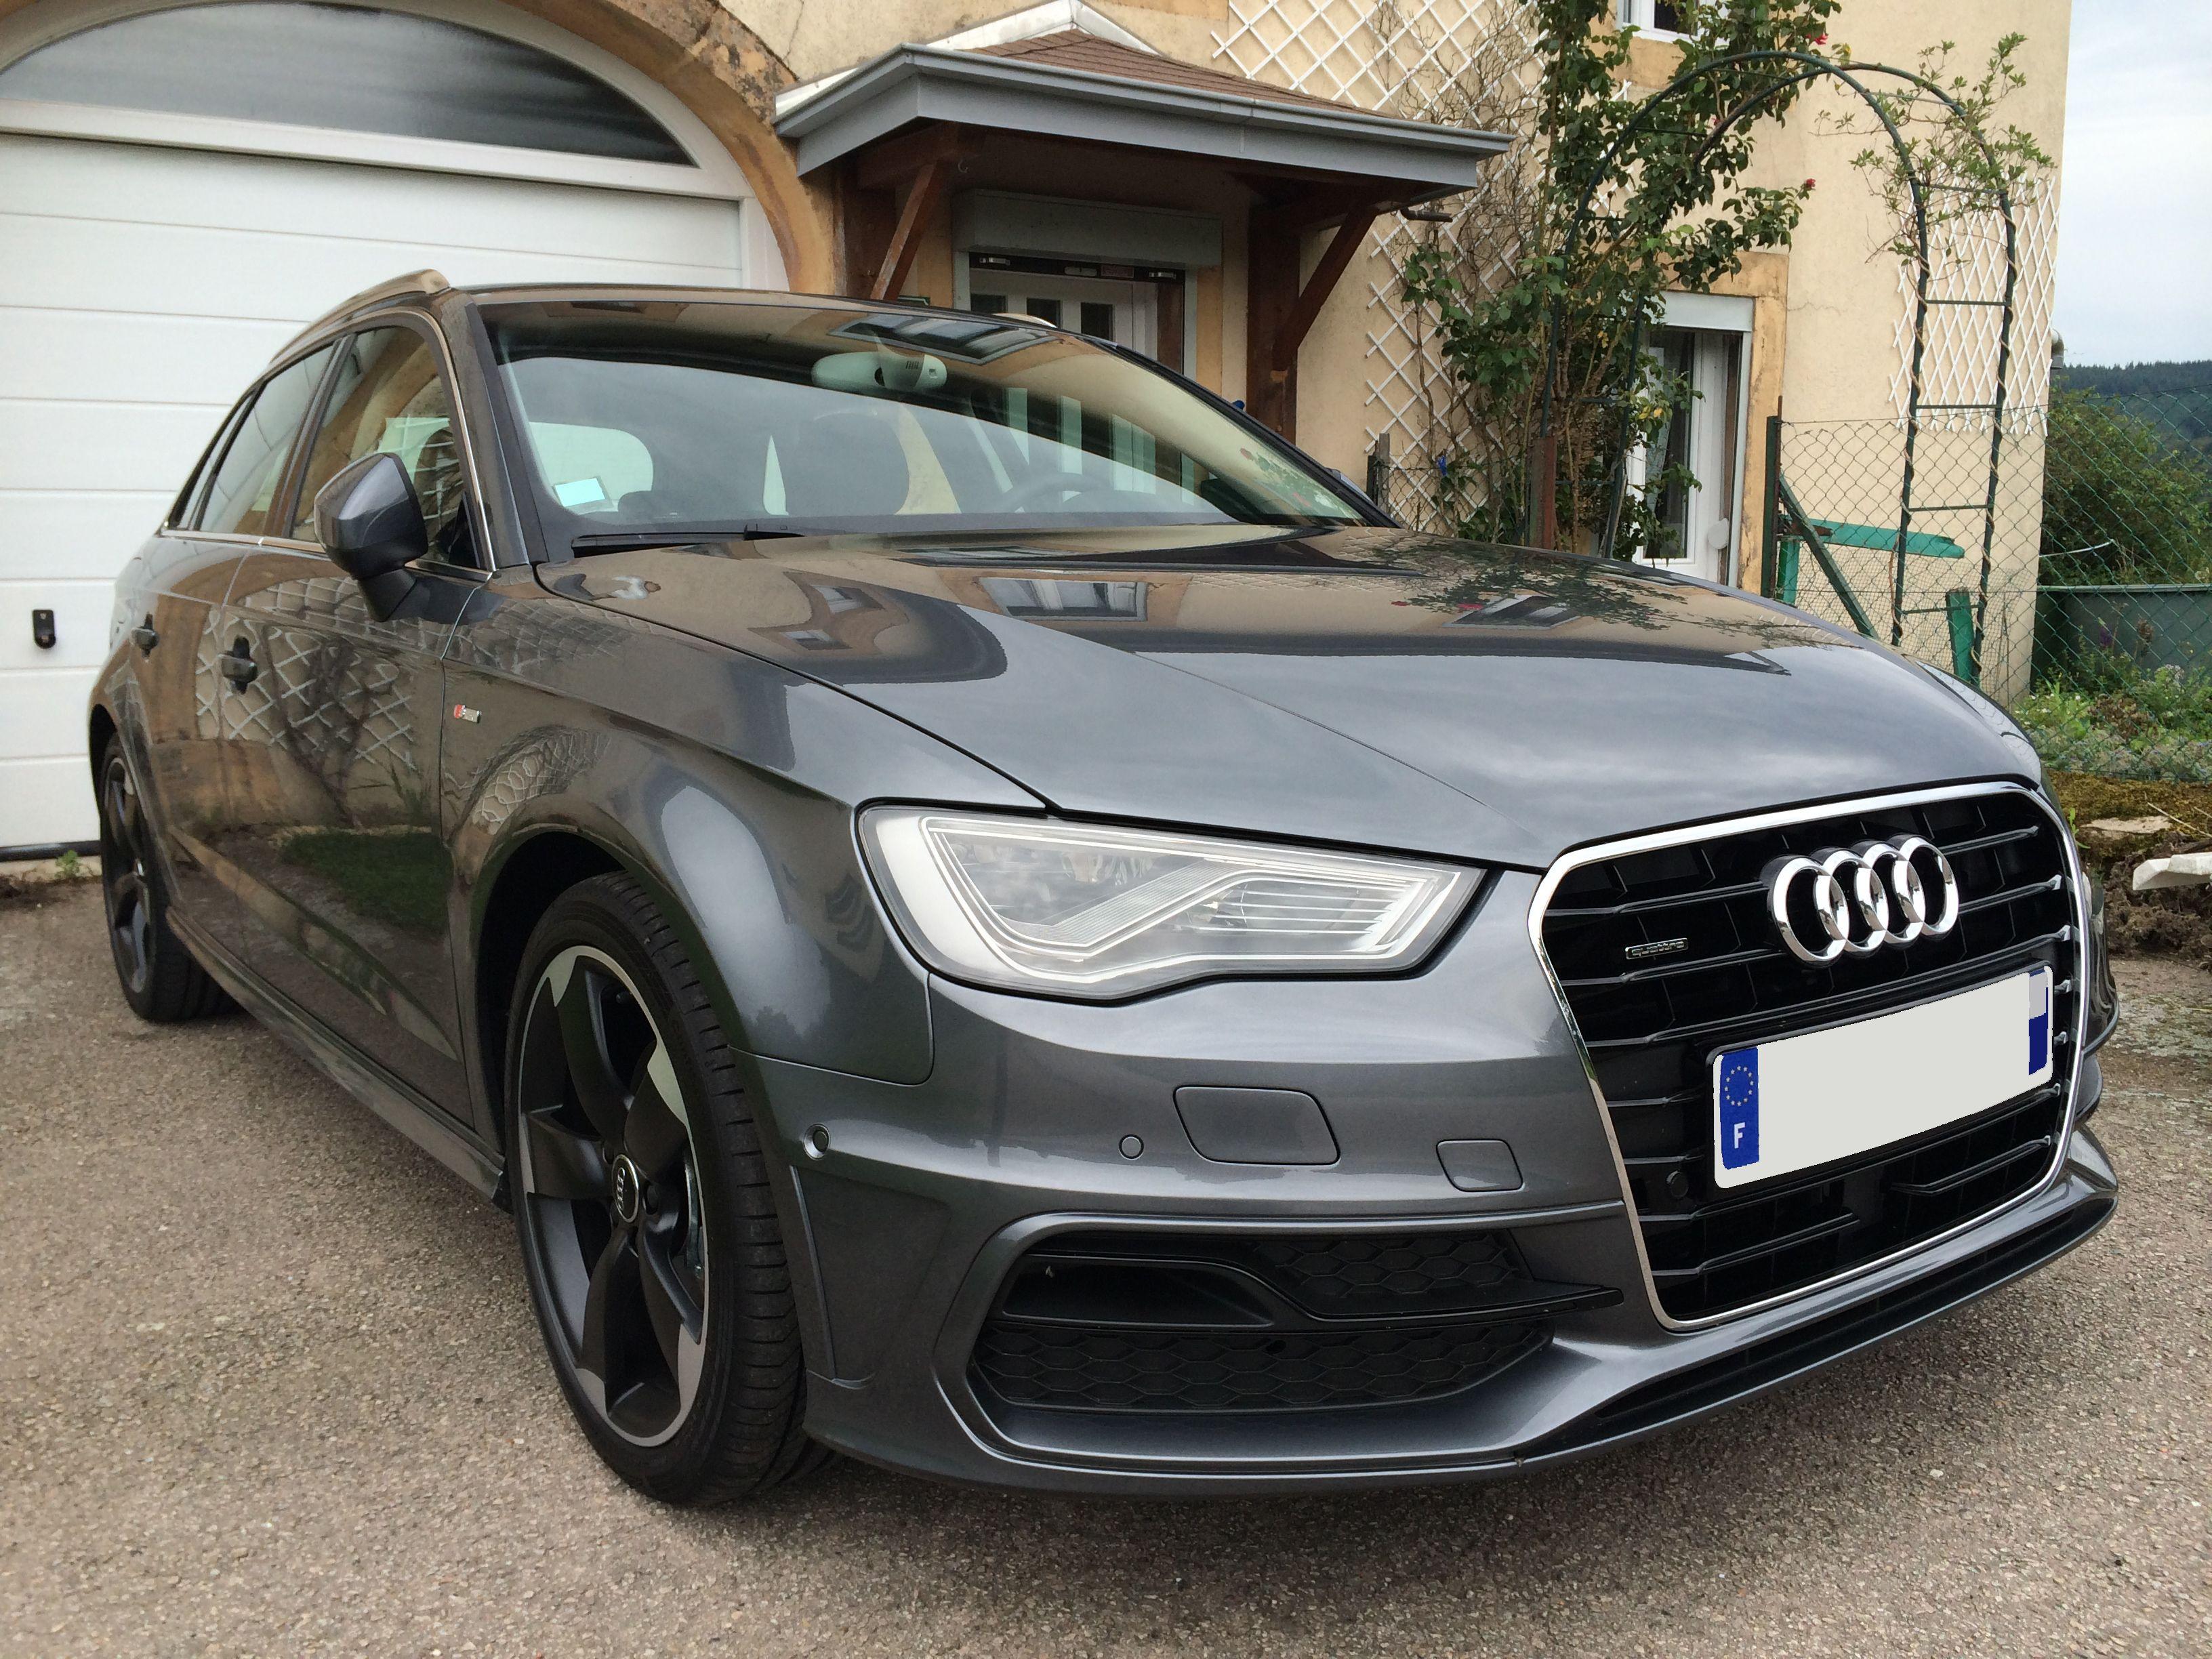 Image Result For Audi A Sportback Grigio Monsone